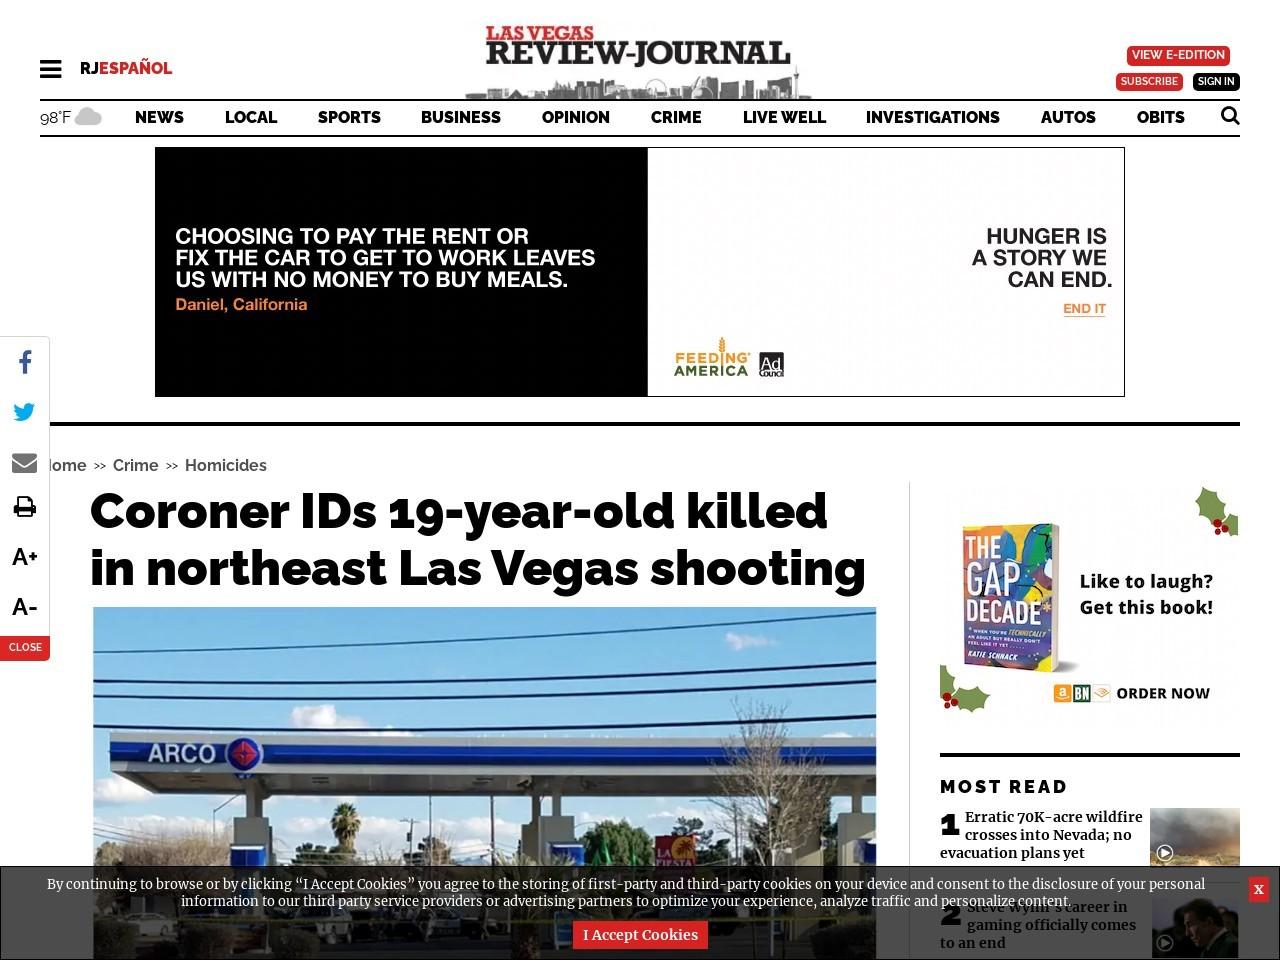 Coroner IDs 19-year-old killed in northeast Las Vegas shooting